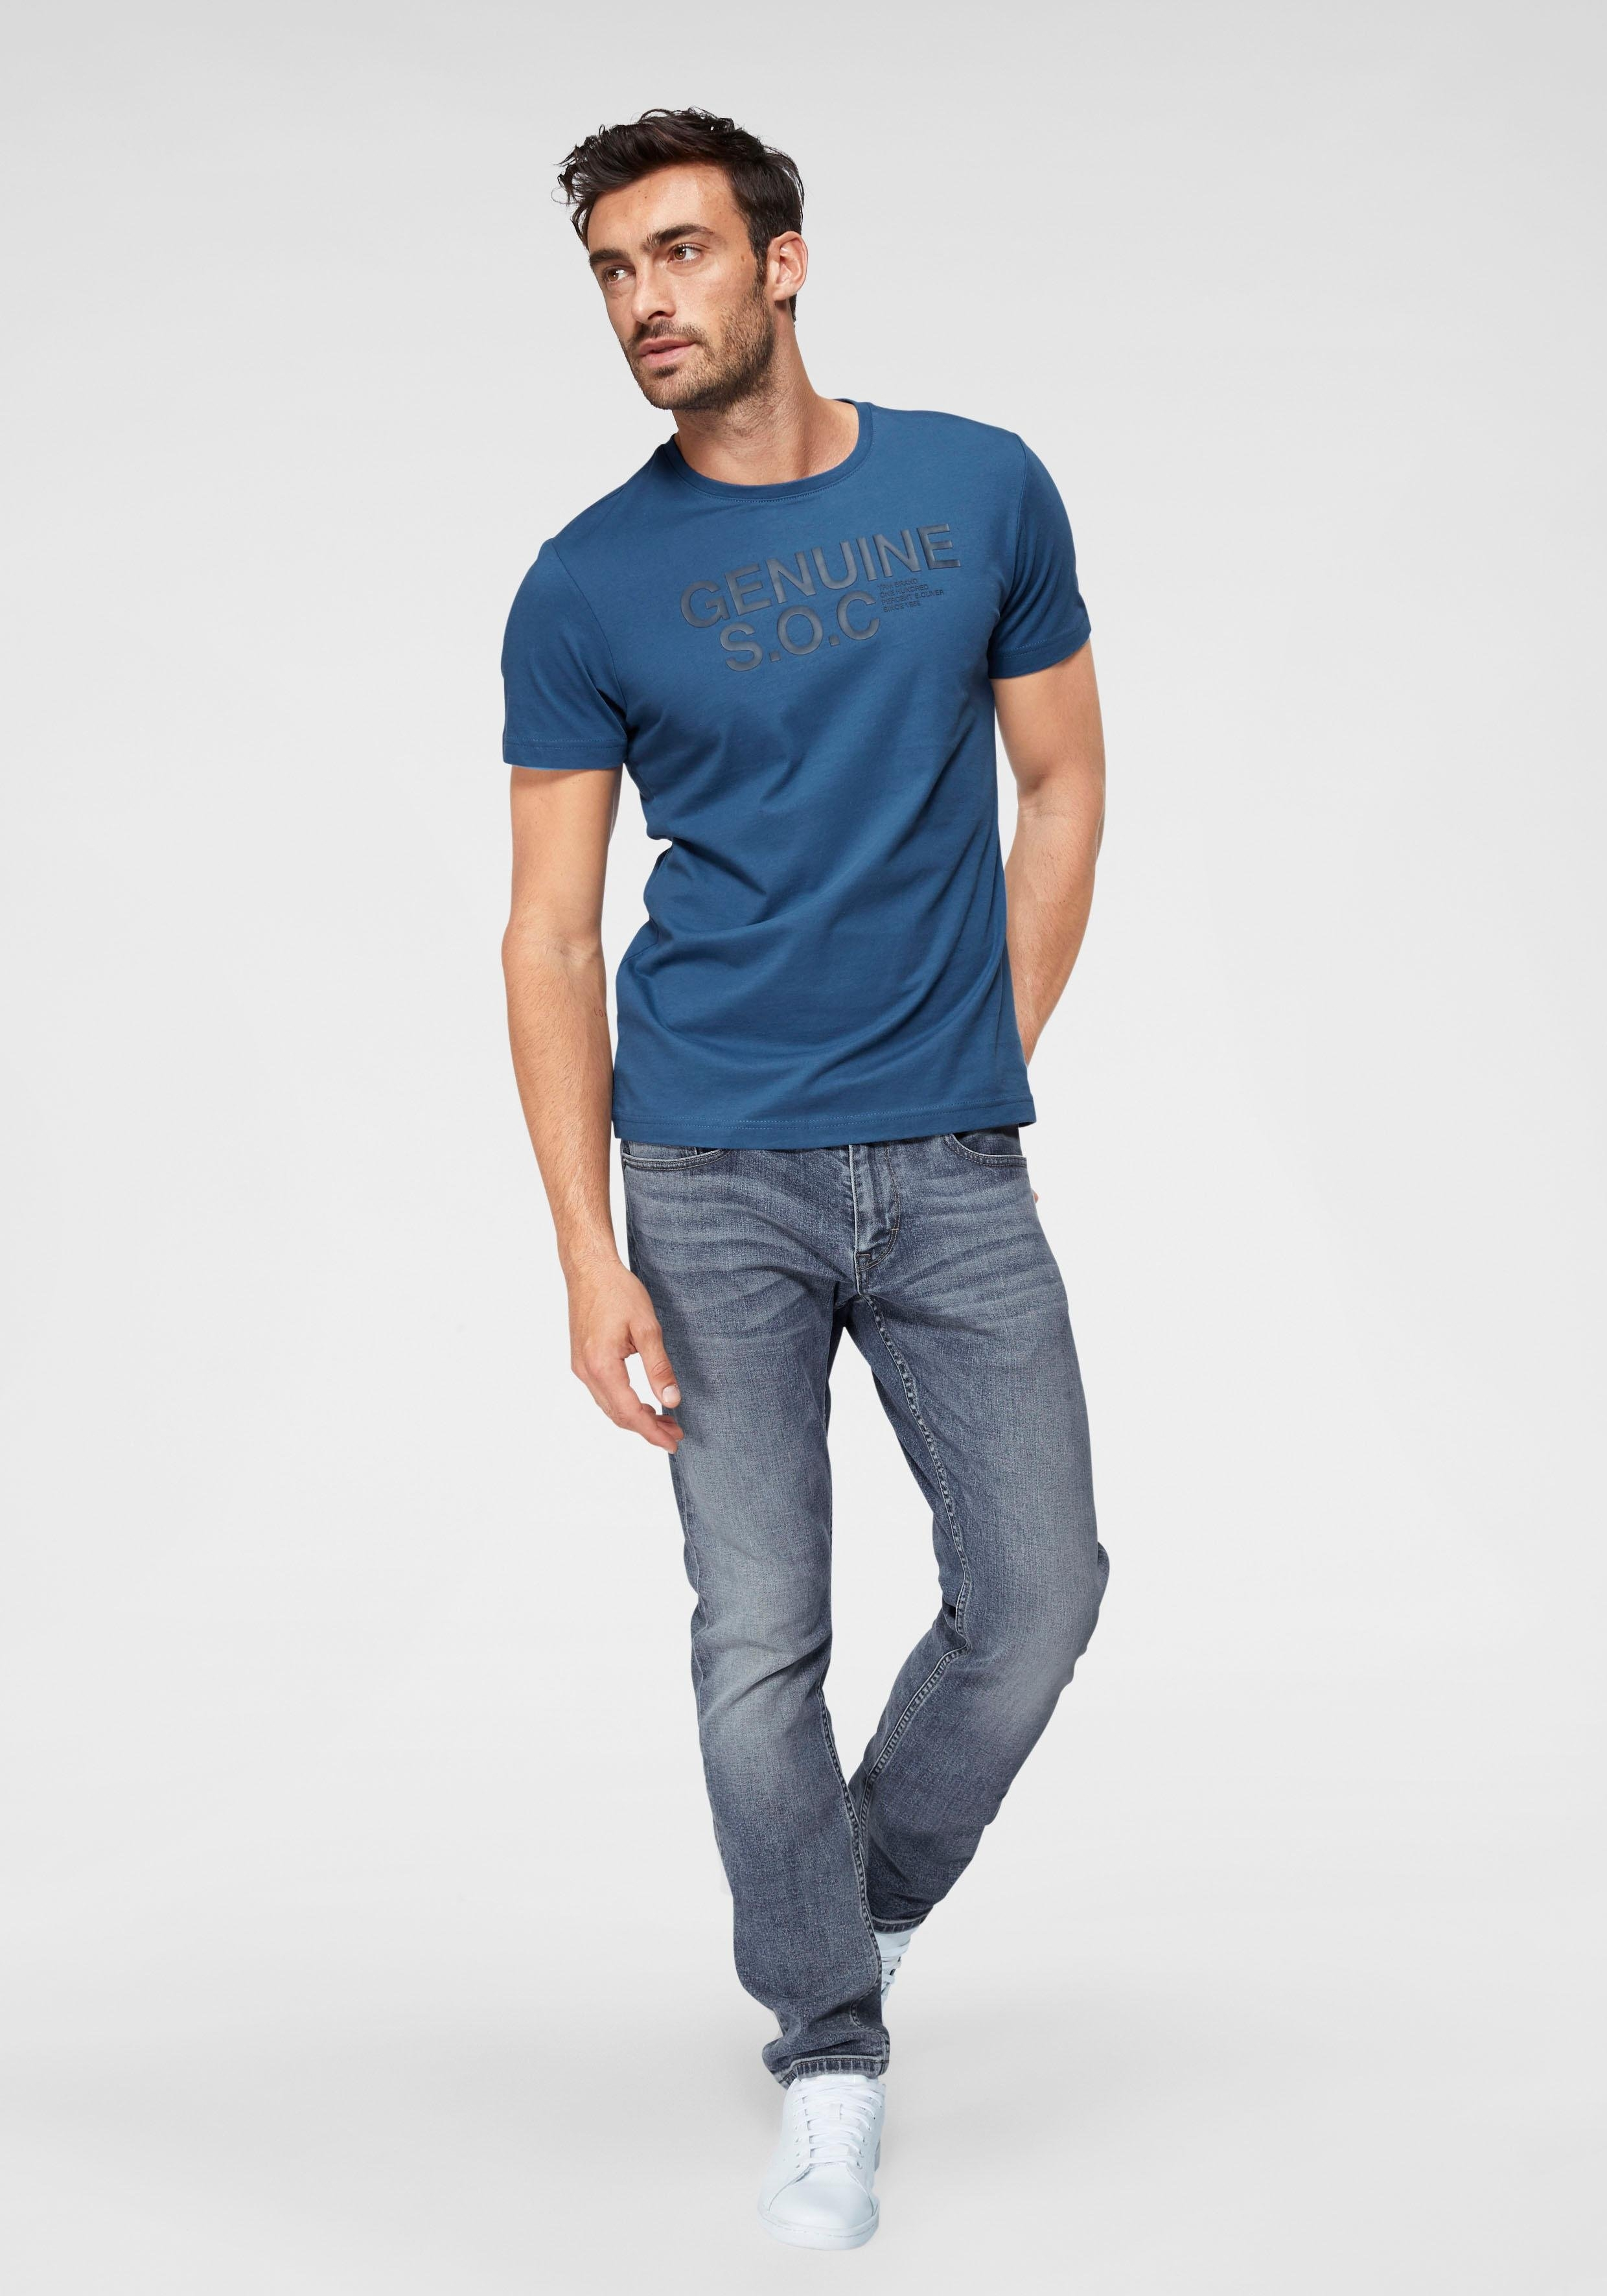 Snel Gevonden oliver shirt S Label Red T 0knPwN8OX